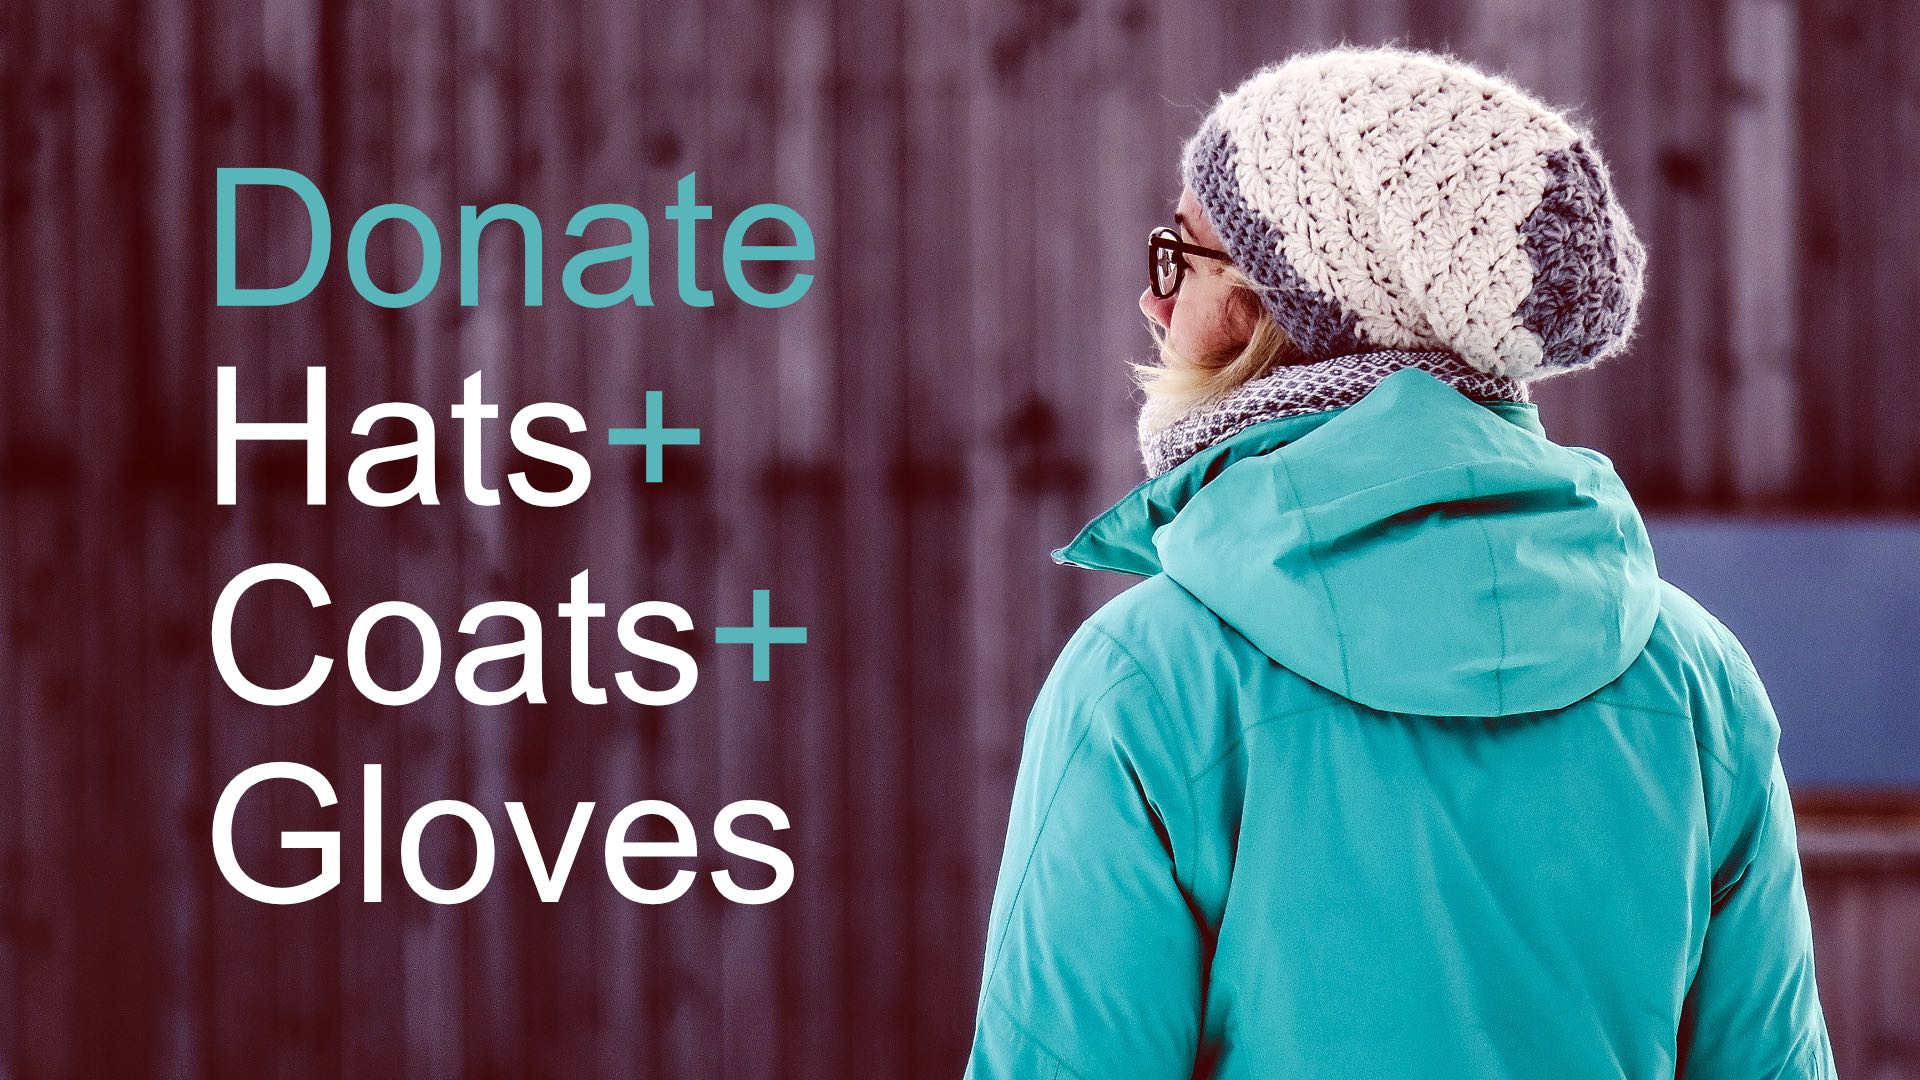 donate_coats-squashed